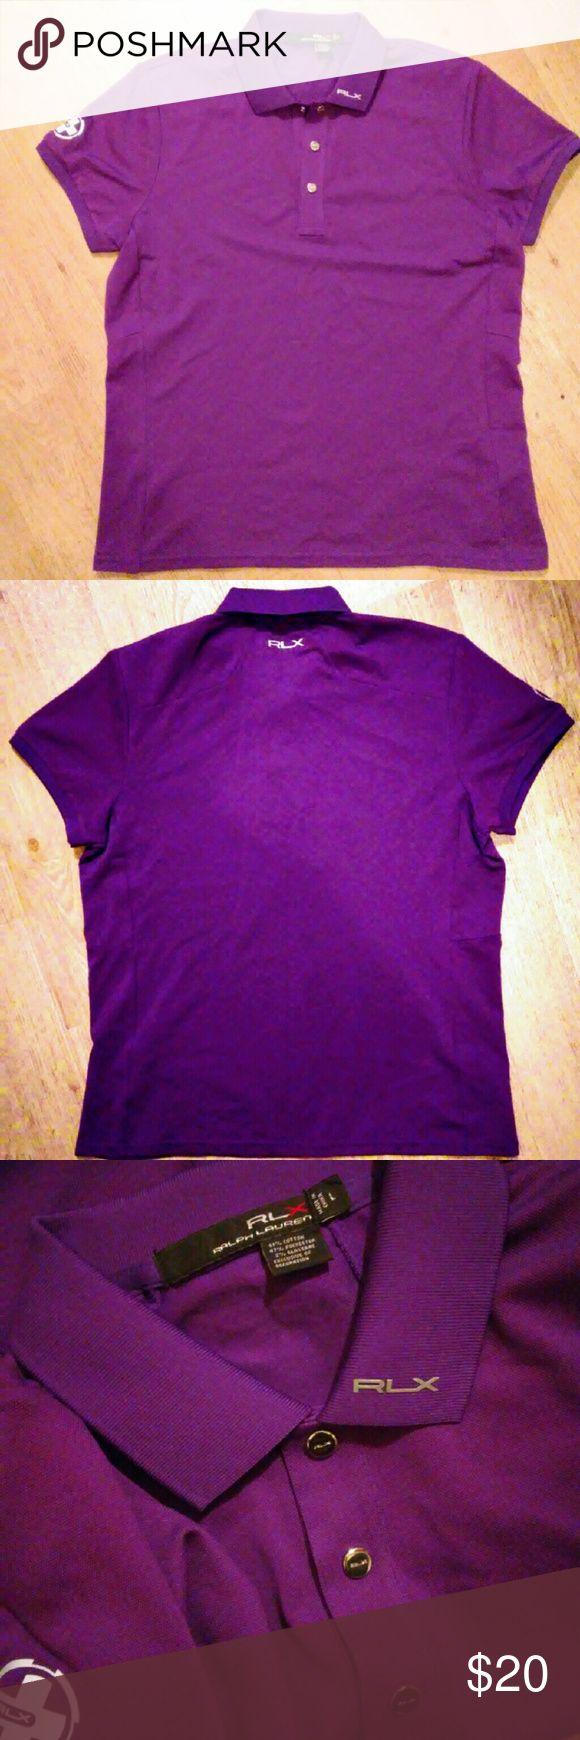 RLX polo golf shirt Ralp Lauren Size L Purple color Never worn Size L Ralph Lauren Tops Tees - Short Sleeve